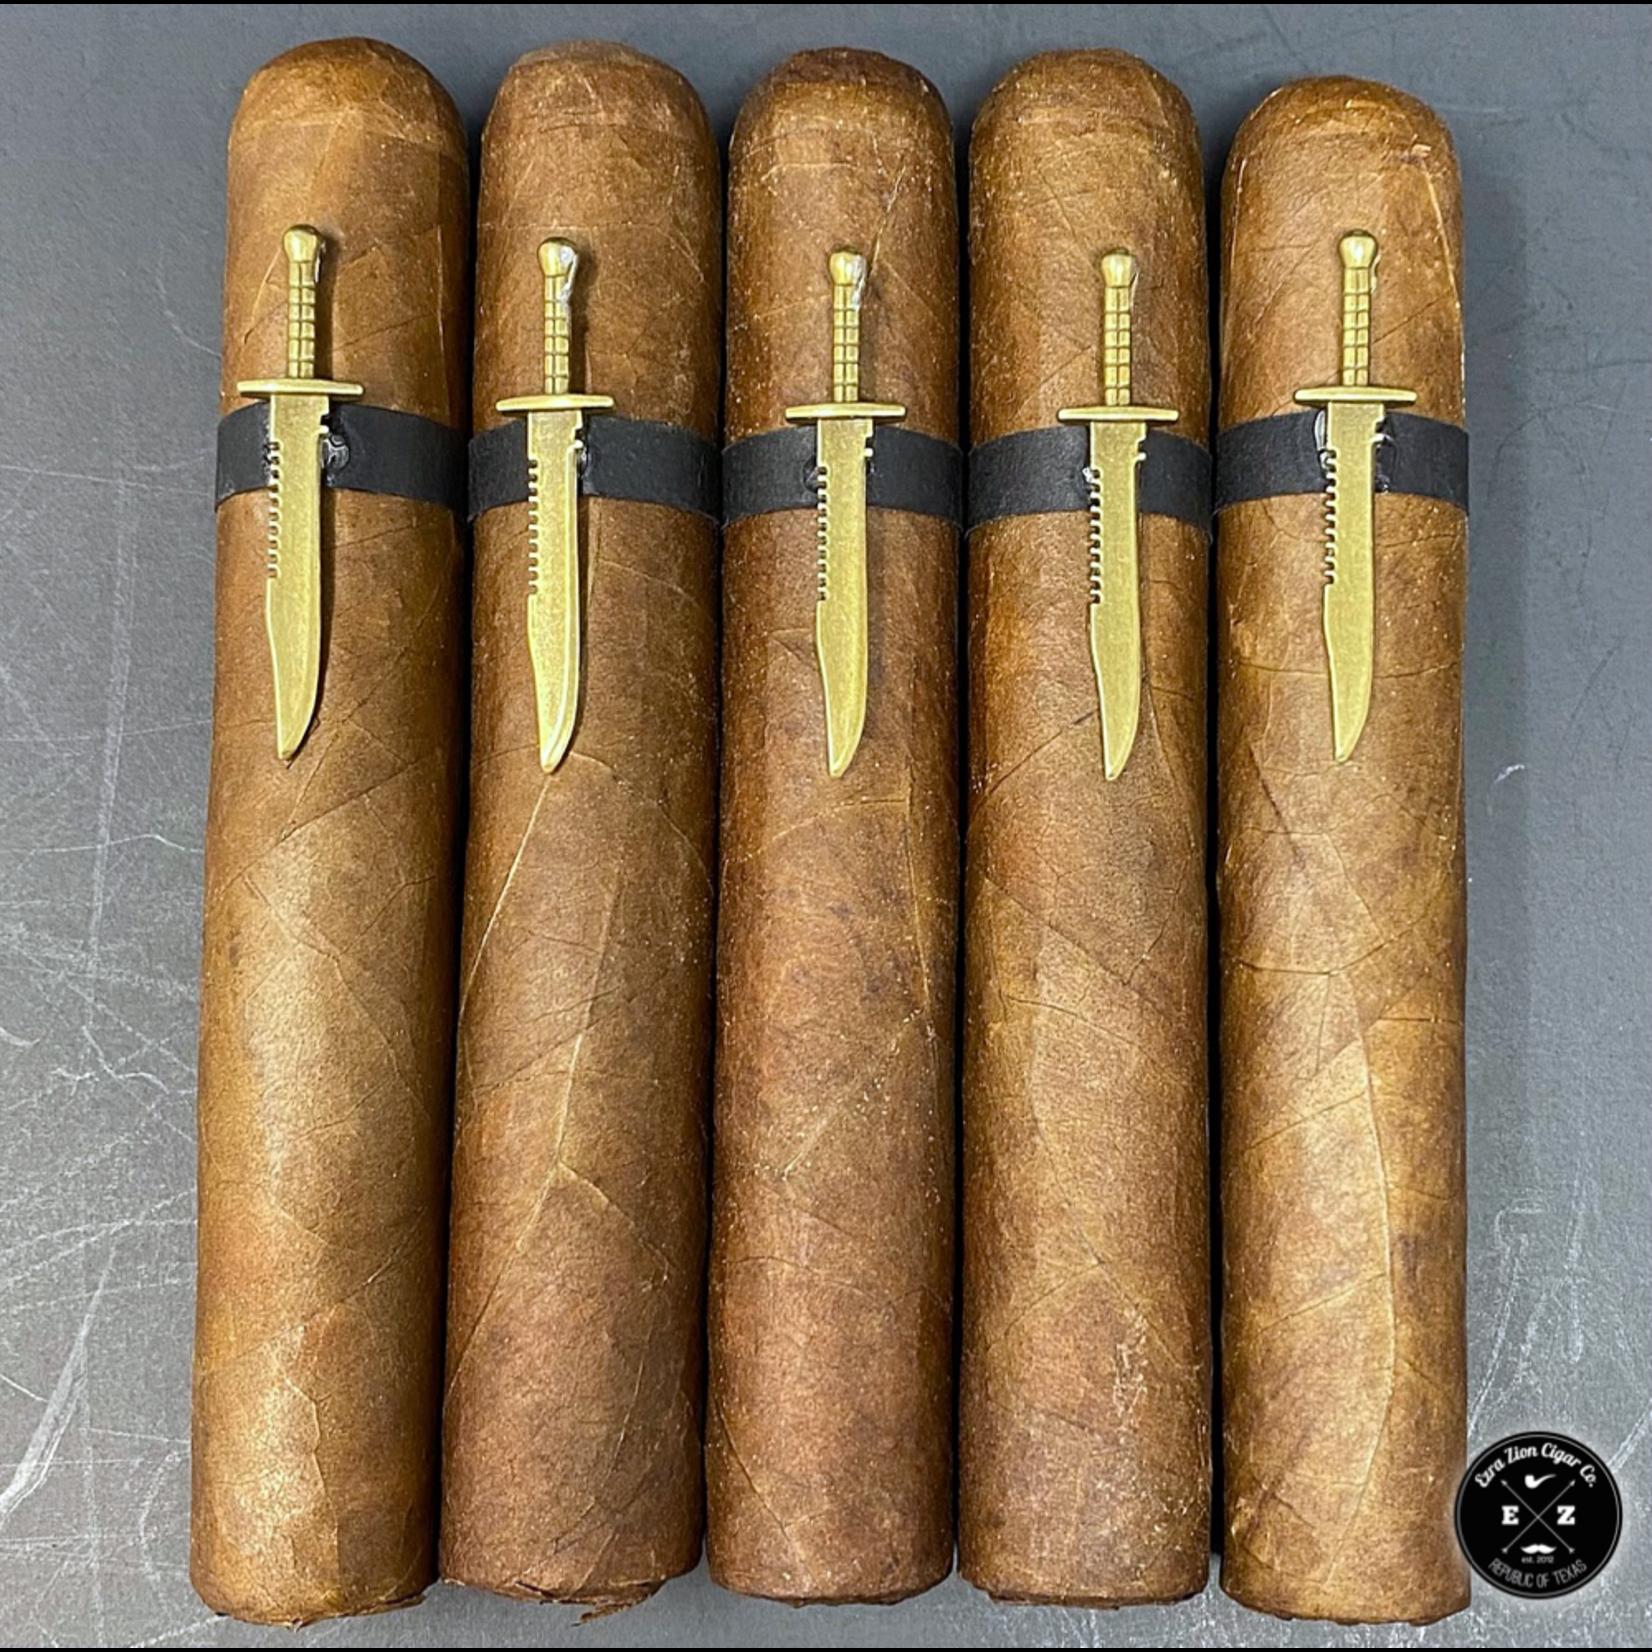 Ezra Zion Cigars Knife Fight XQ Edition